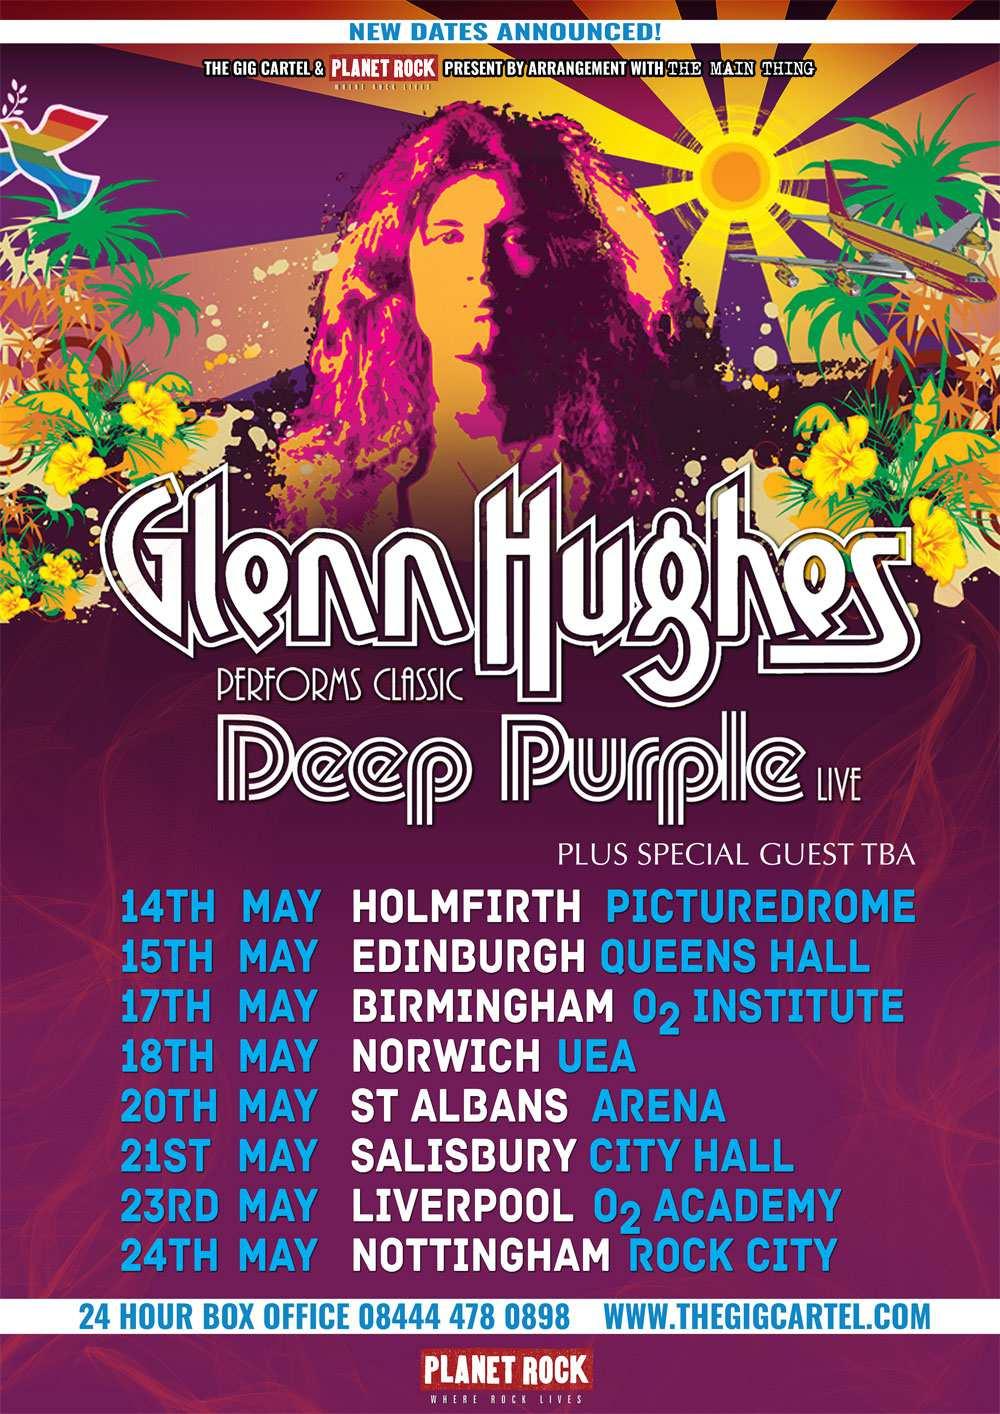 Glenn Hughes Tour Dates 2019